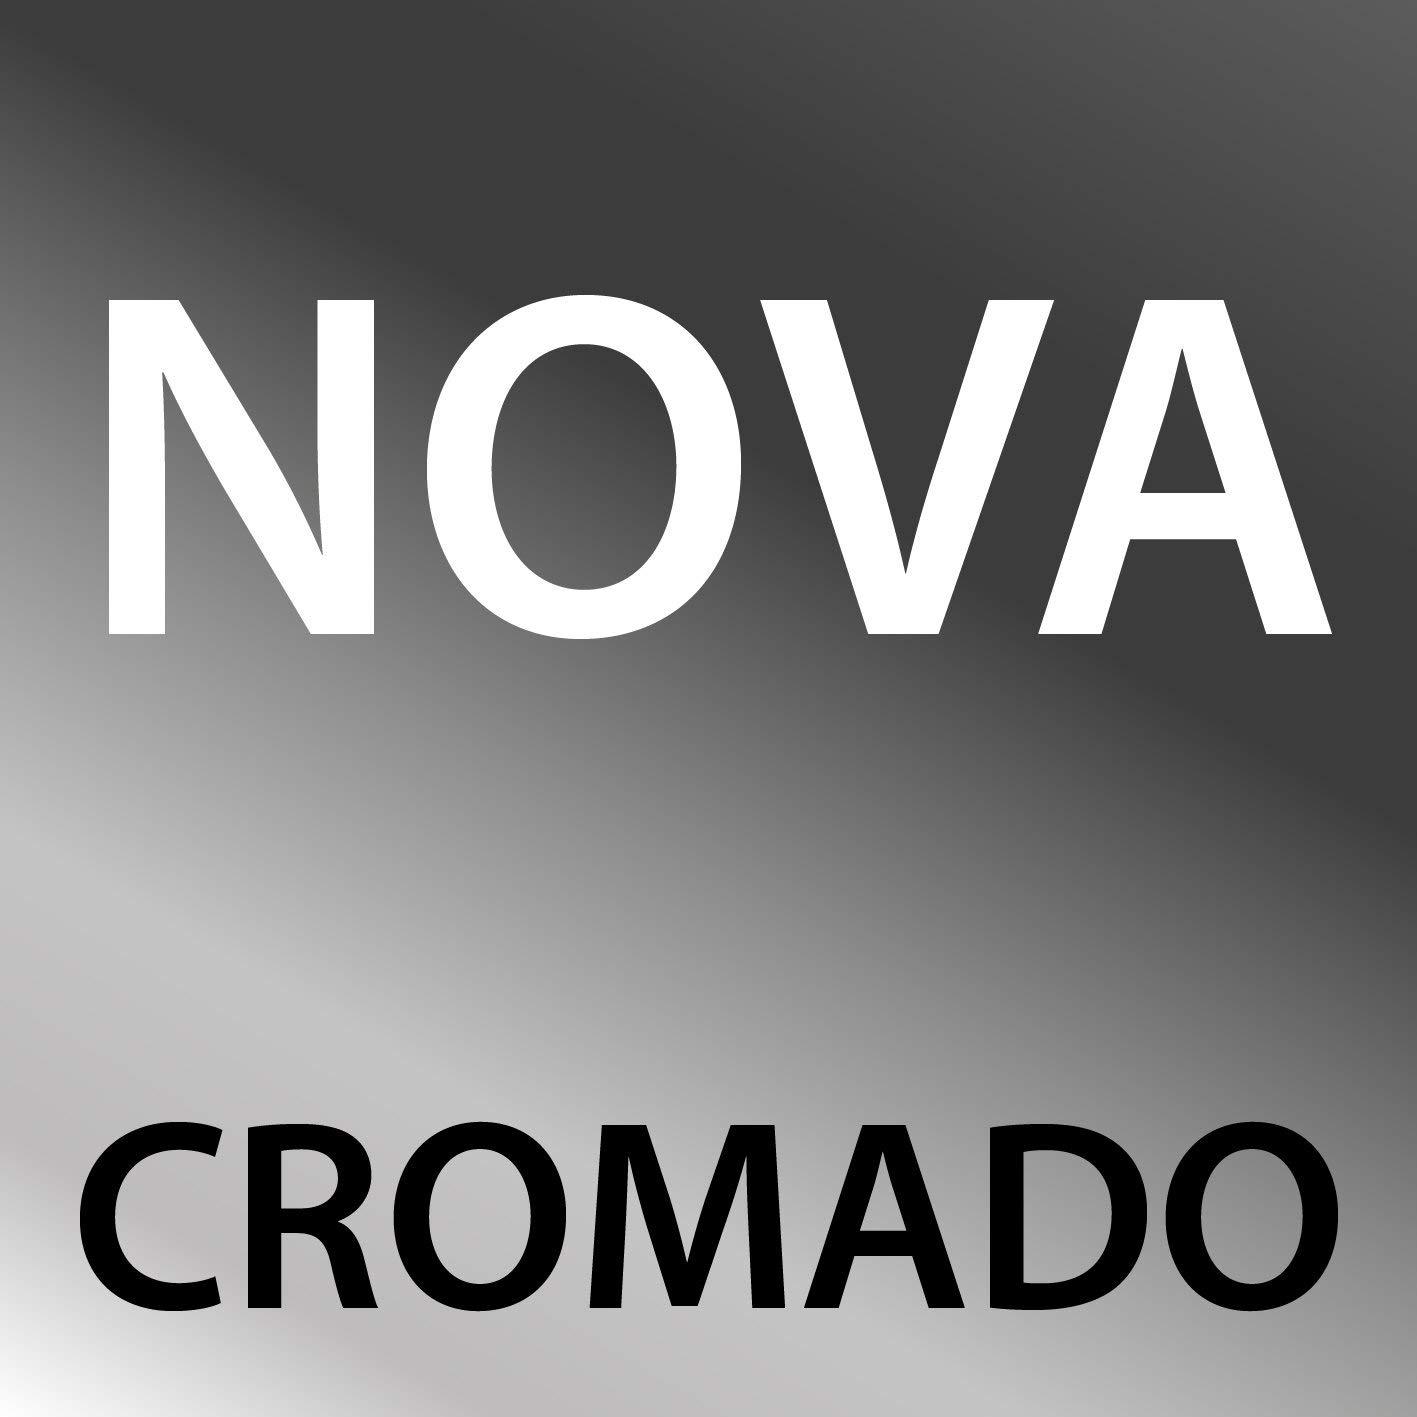 farho Radiador TOALLERO Electrico Bajo Consumo Nova Cromado /·/· 800 Watios /· Toalleros El/éctricos con Termostato Digital Programable Medidas 1200 x 500mm /·/· 5 A/ÑOS de Garantia